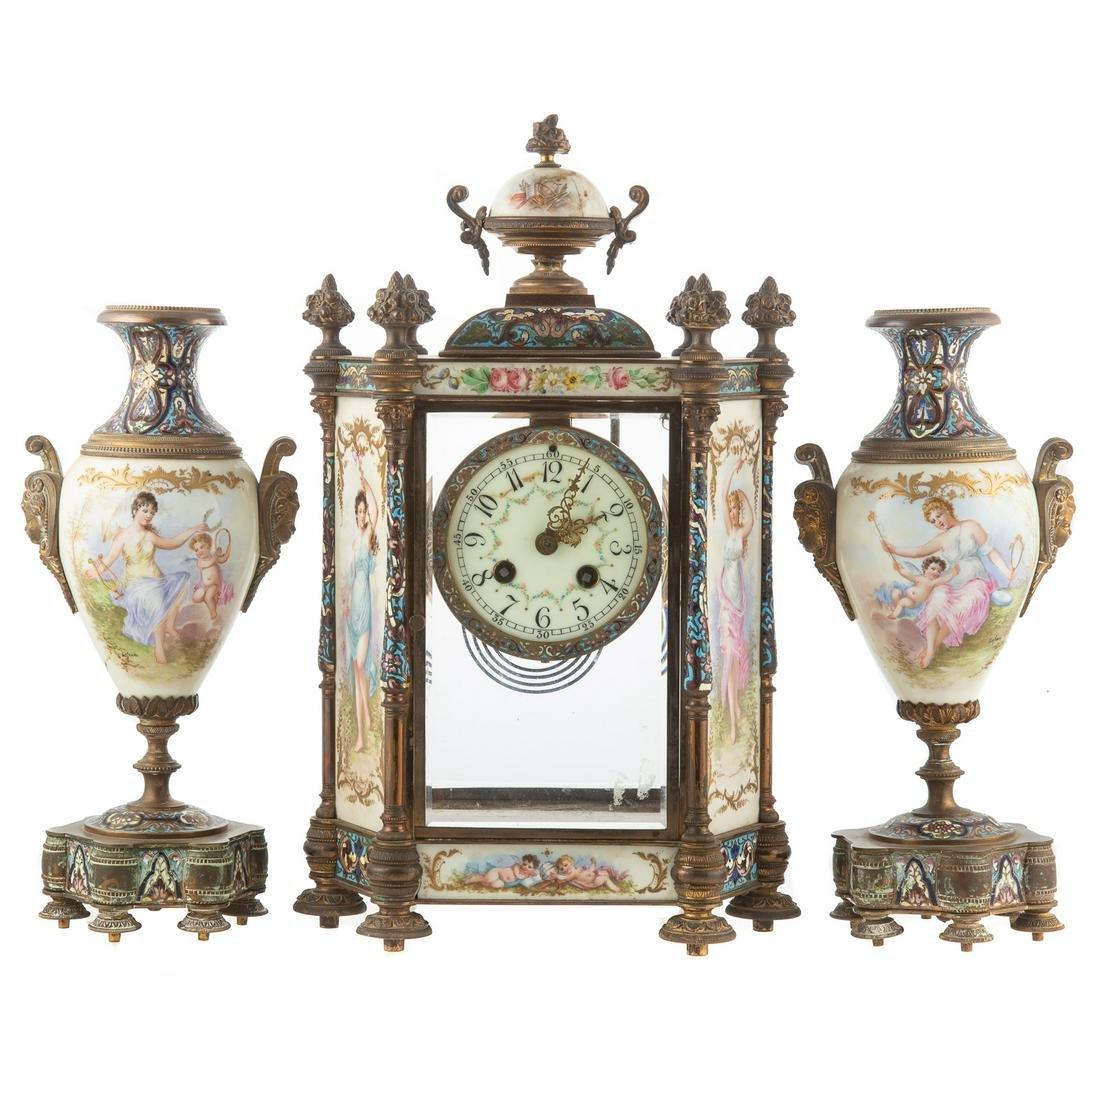 French Champleve/Brass Clock Garniture